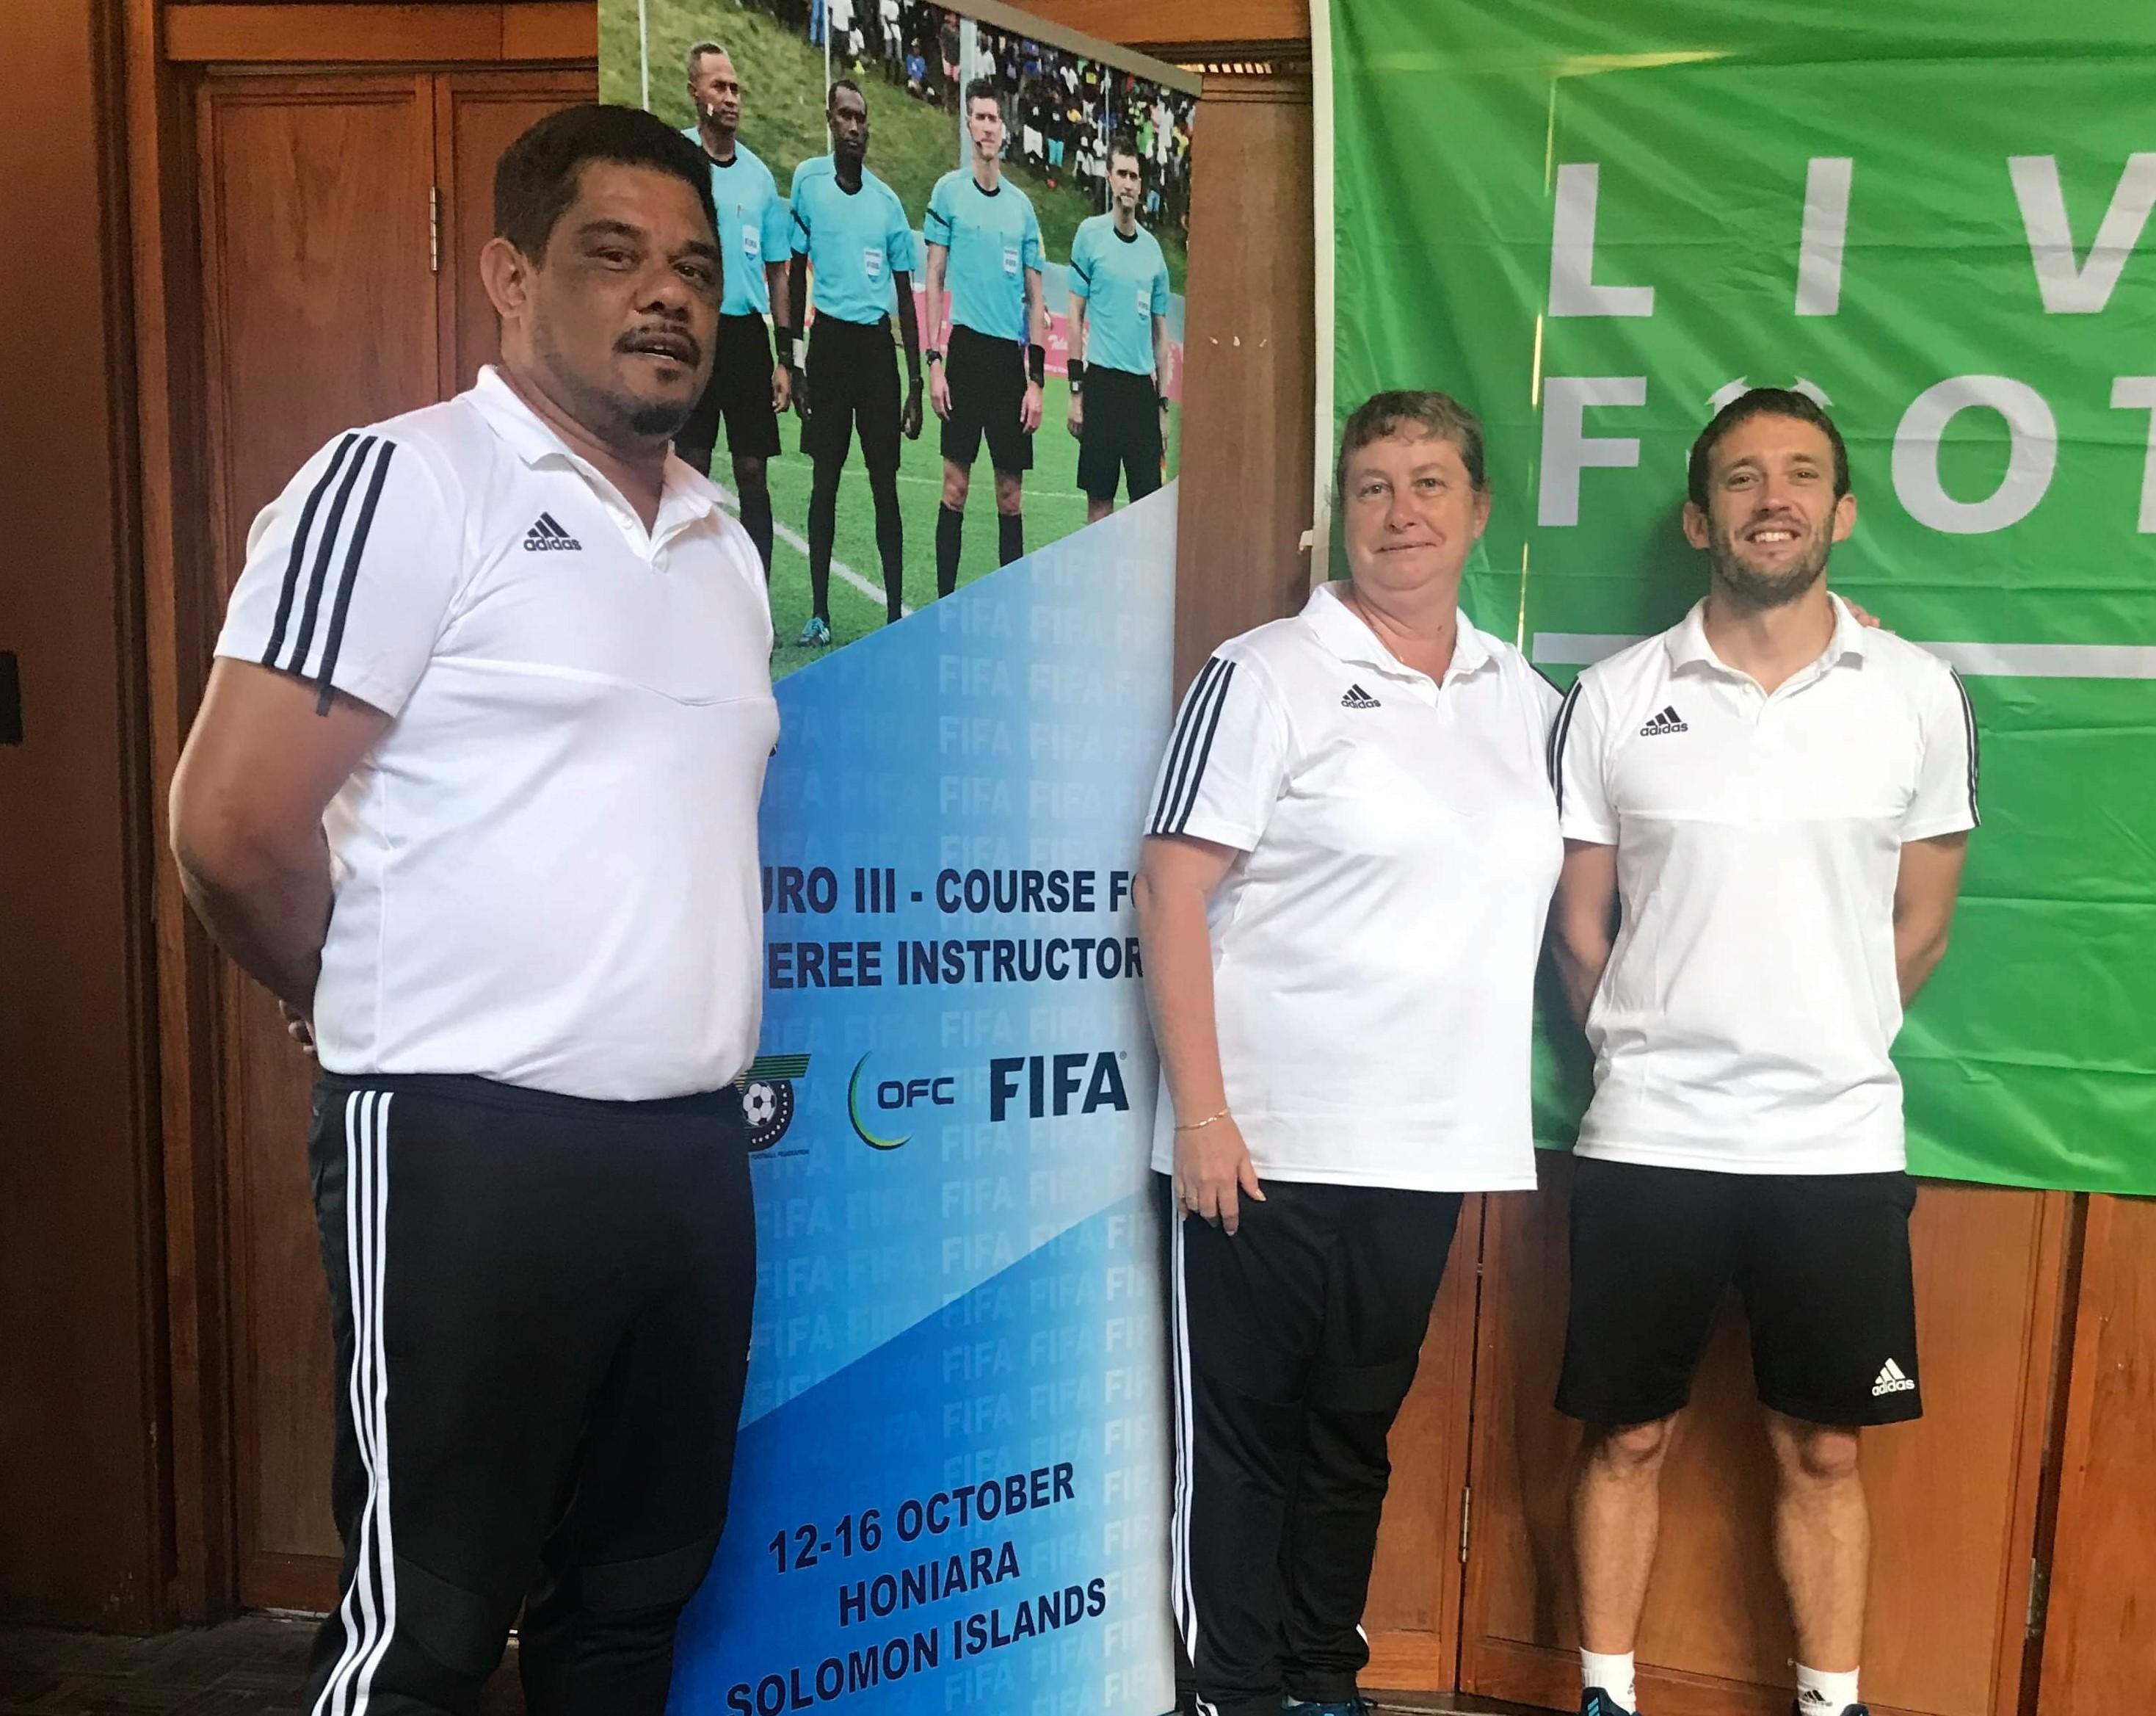 Marius Gaïcoin, Jacqueline Santino, et Médéric Lacour, ici lors d'une formation FIFA FUTURO III à Honiara, en 2019